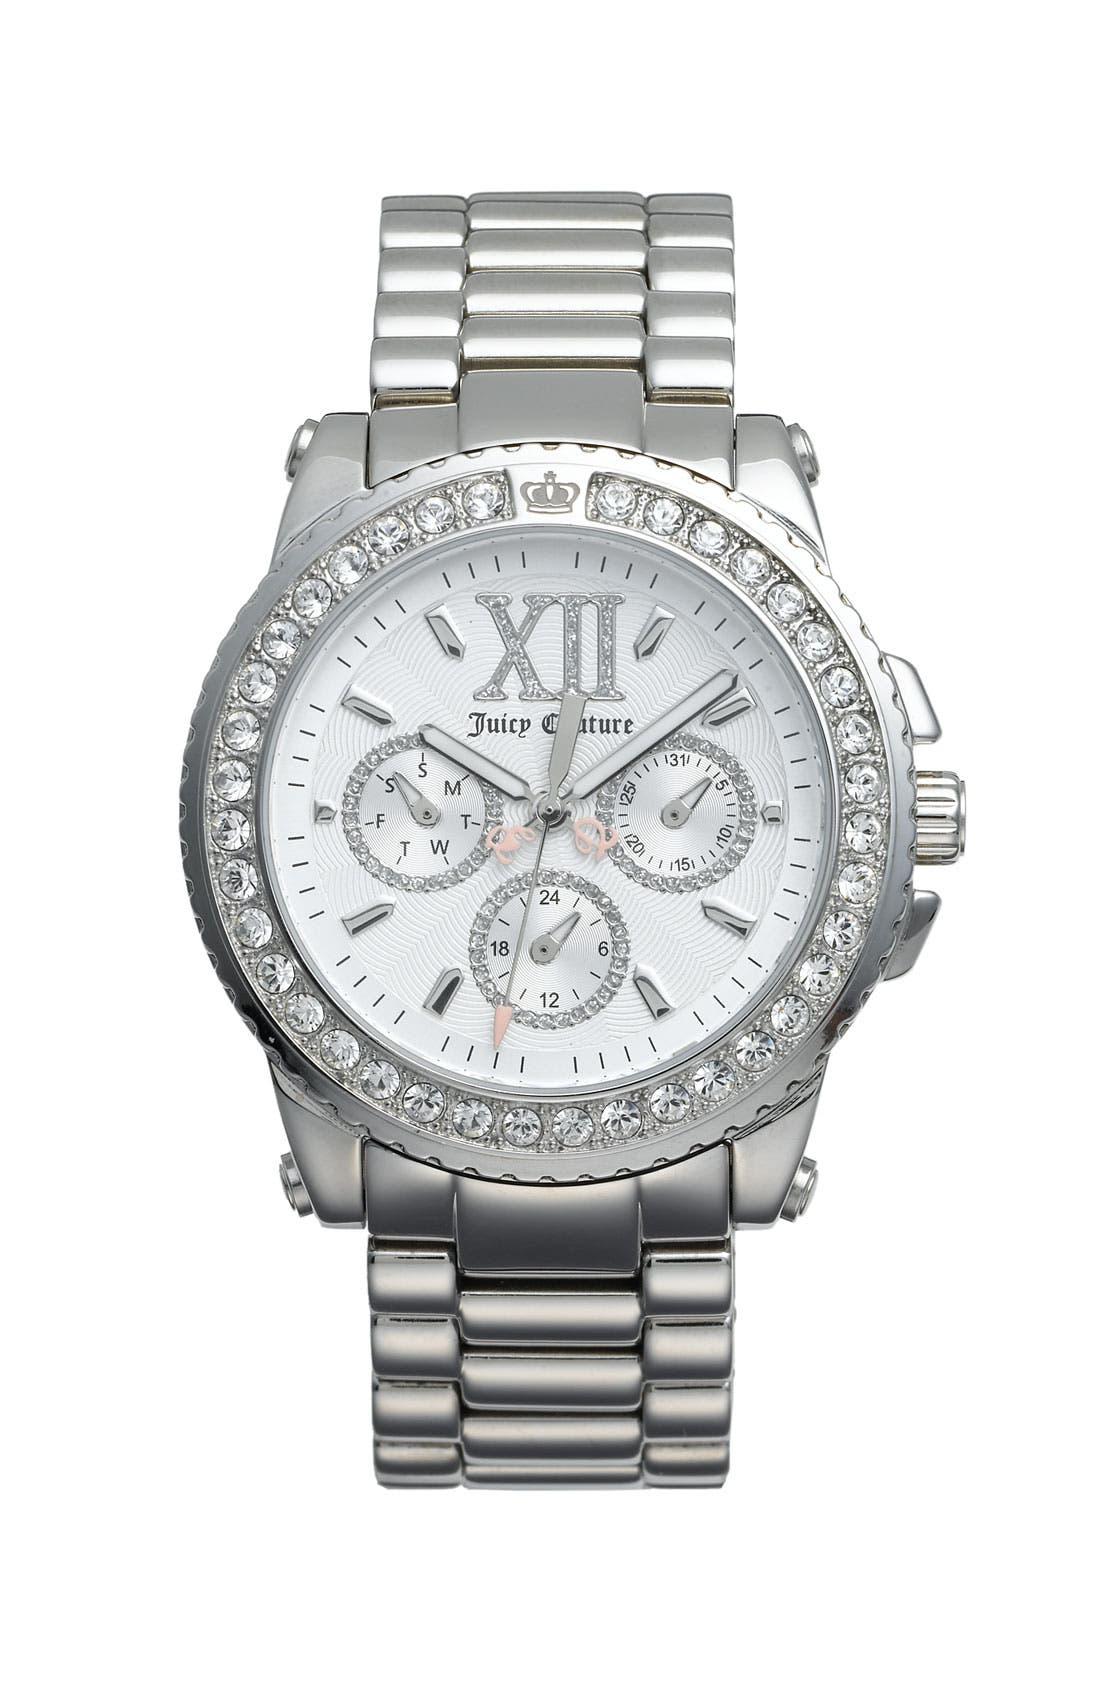 Alternate Image 1 Selected - Juicy Couture 'Pedigree' Stainless Steel Bracelet Watch, 39mm